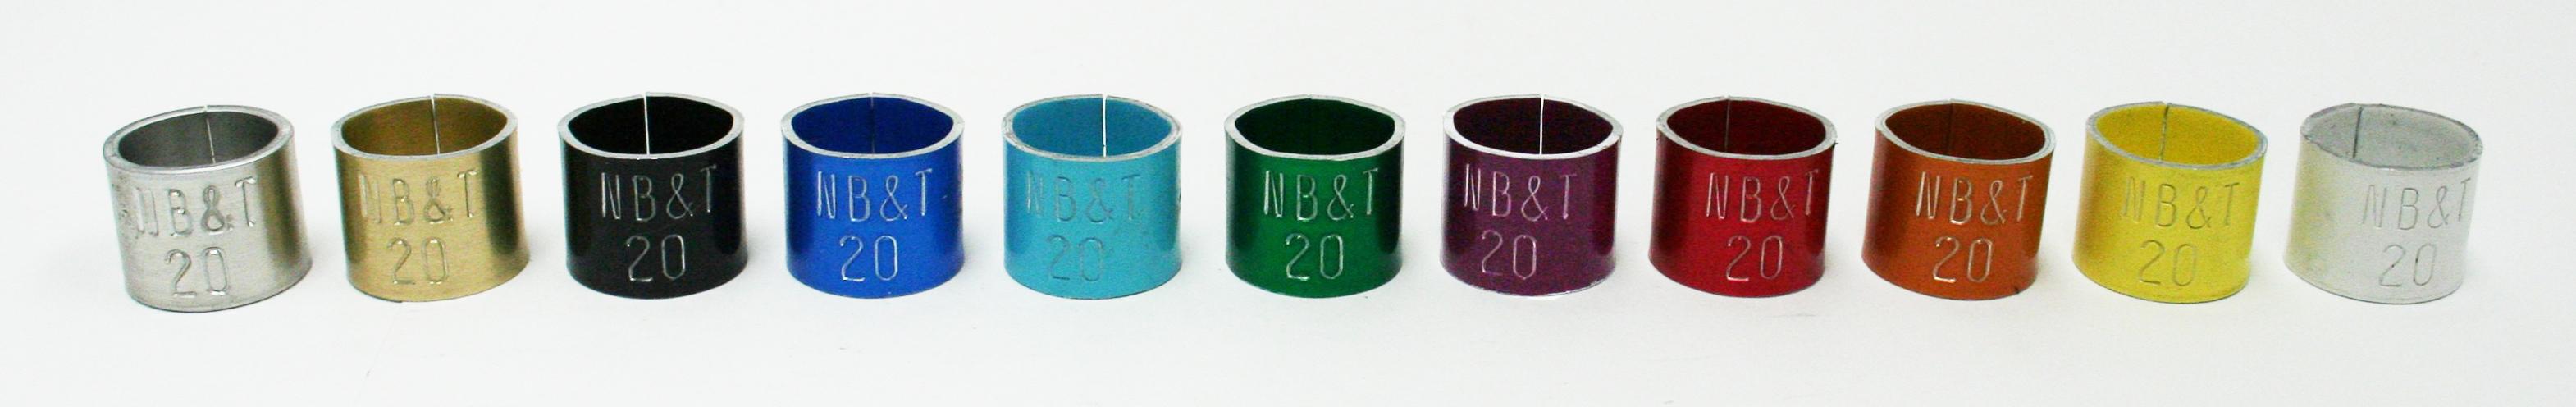 1242-20 colors